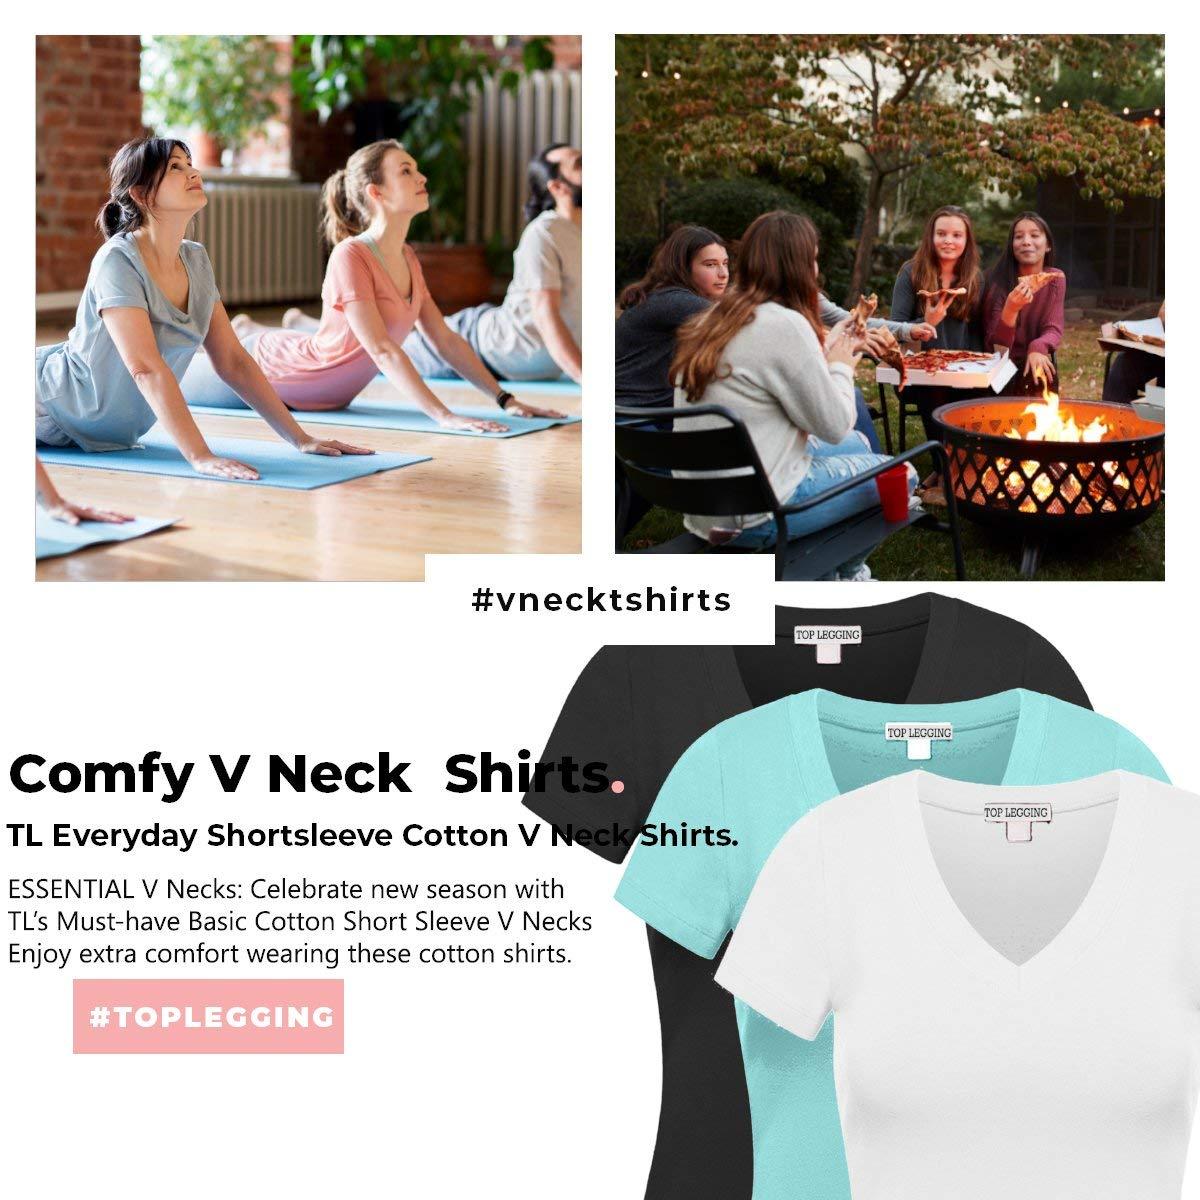 770eafbc80c6 Amazon.com: TOP LEGGING TL Comfy Basic Cotton Short Sleeve Solid V-Neck  Shirts for Women - Single or 3PK: Clothing